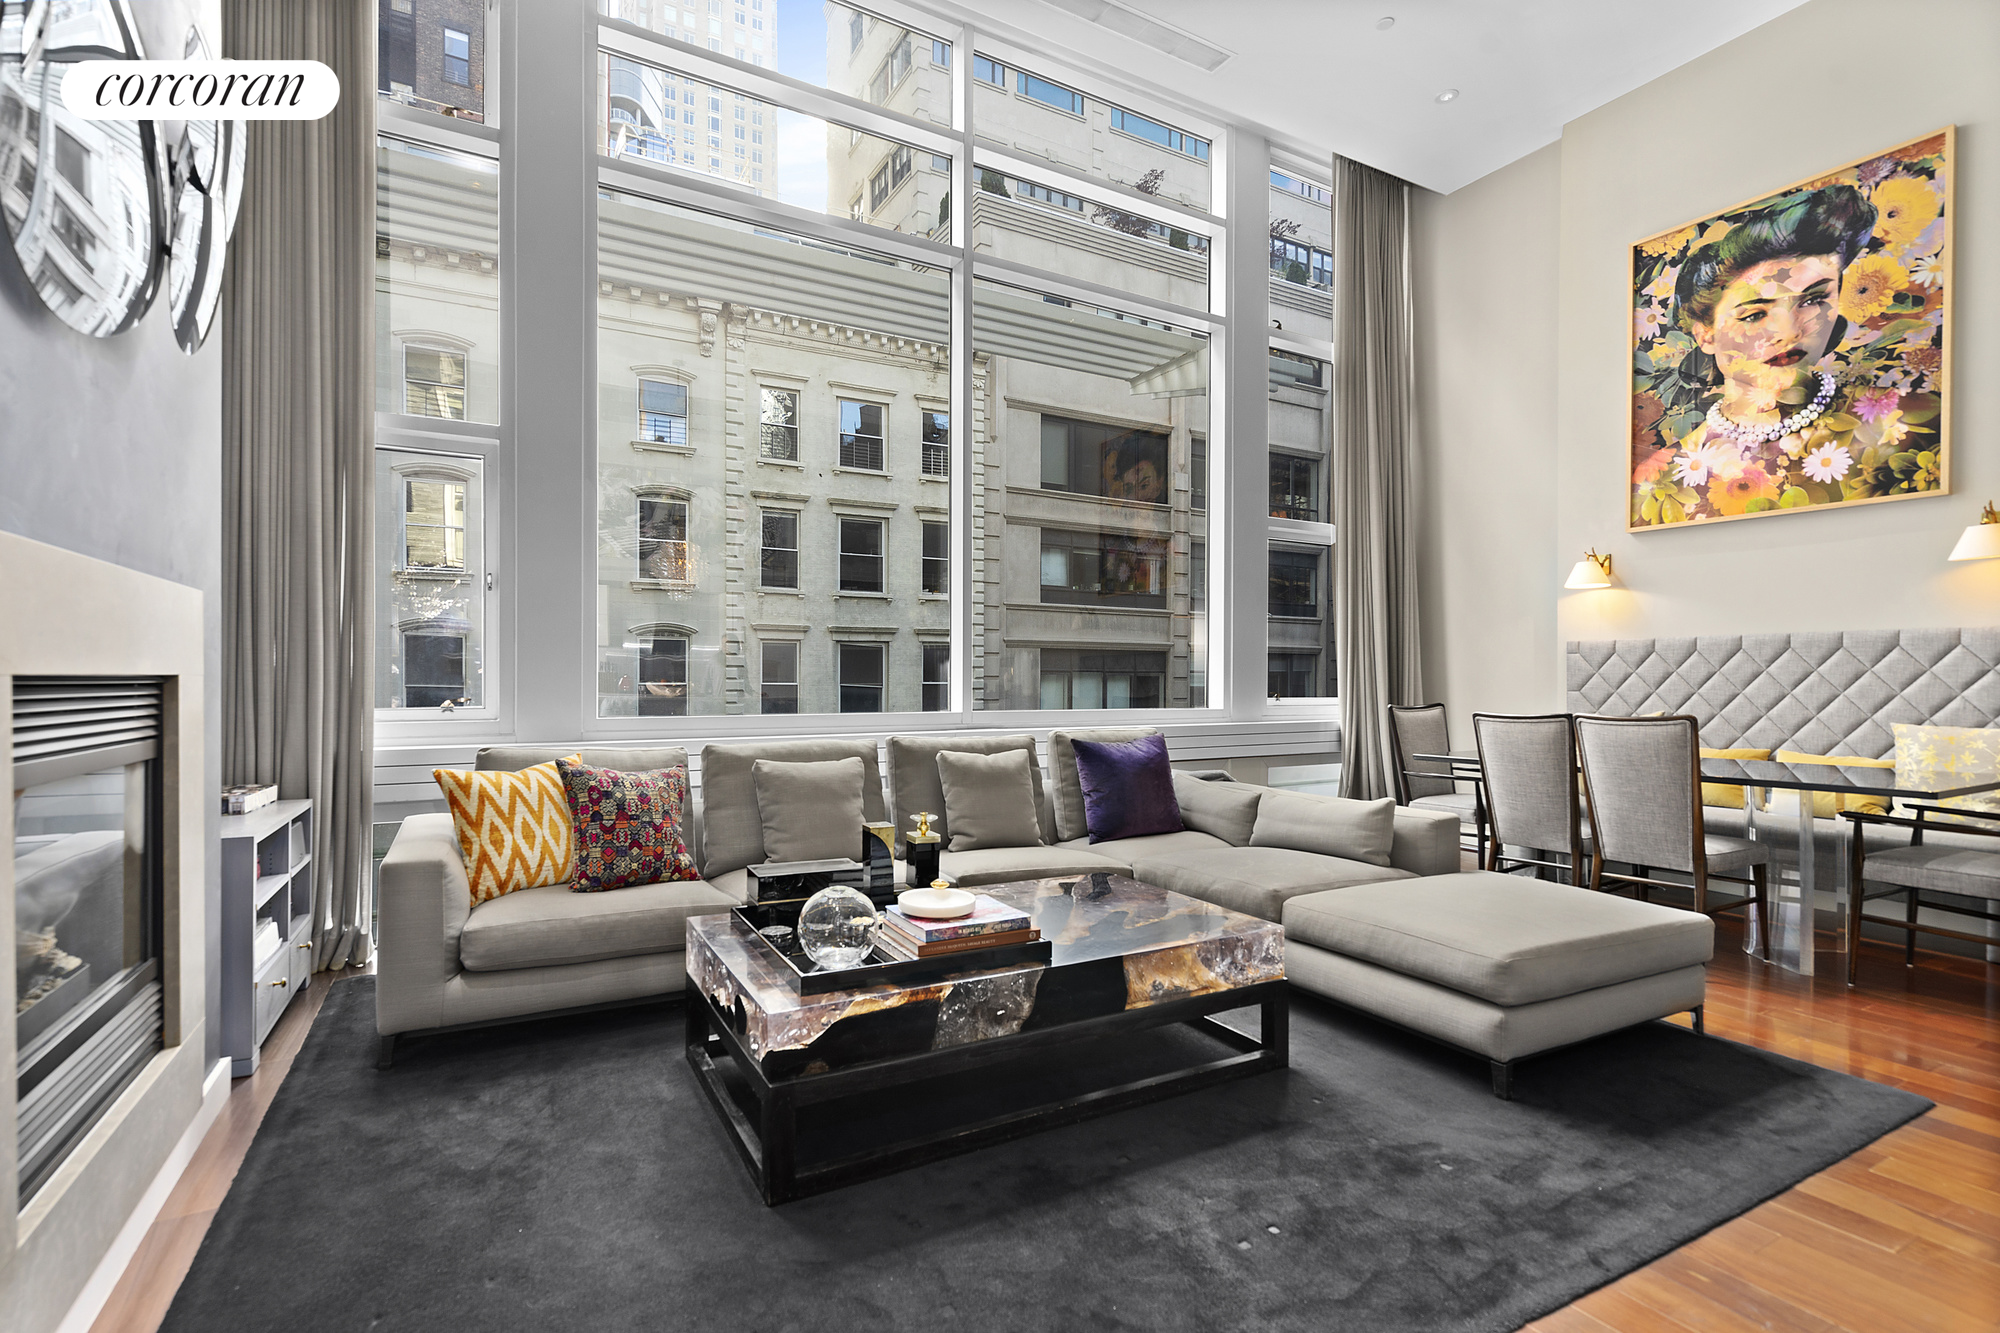 Corcoran 16 Warren St Apt 4 Tribeca Real Estate Manhattan For